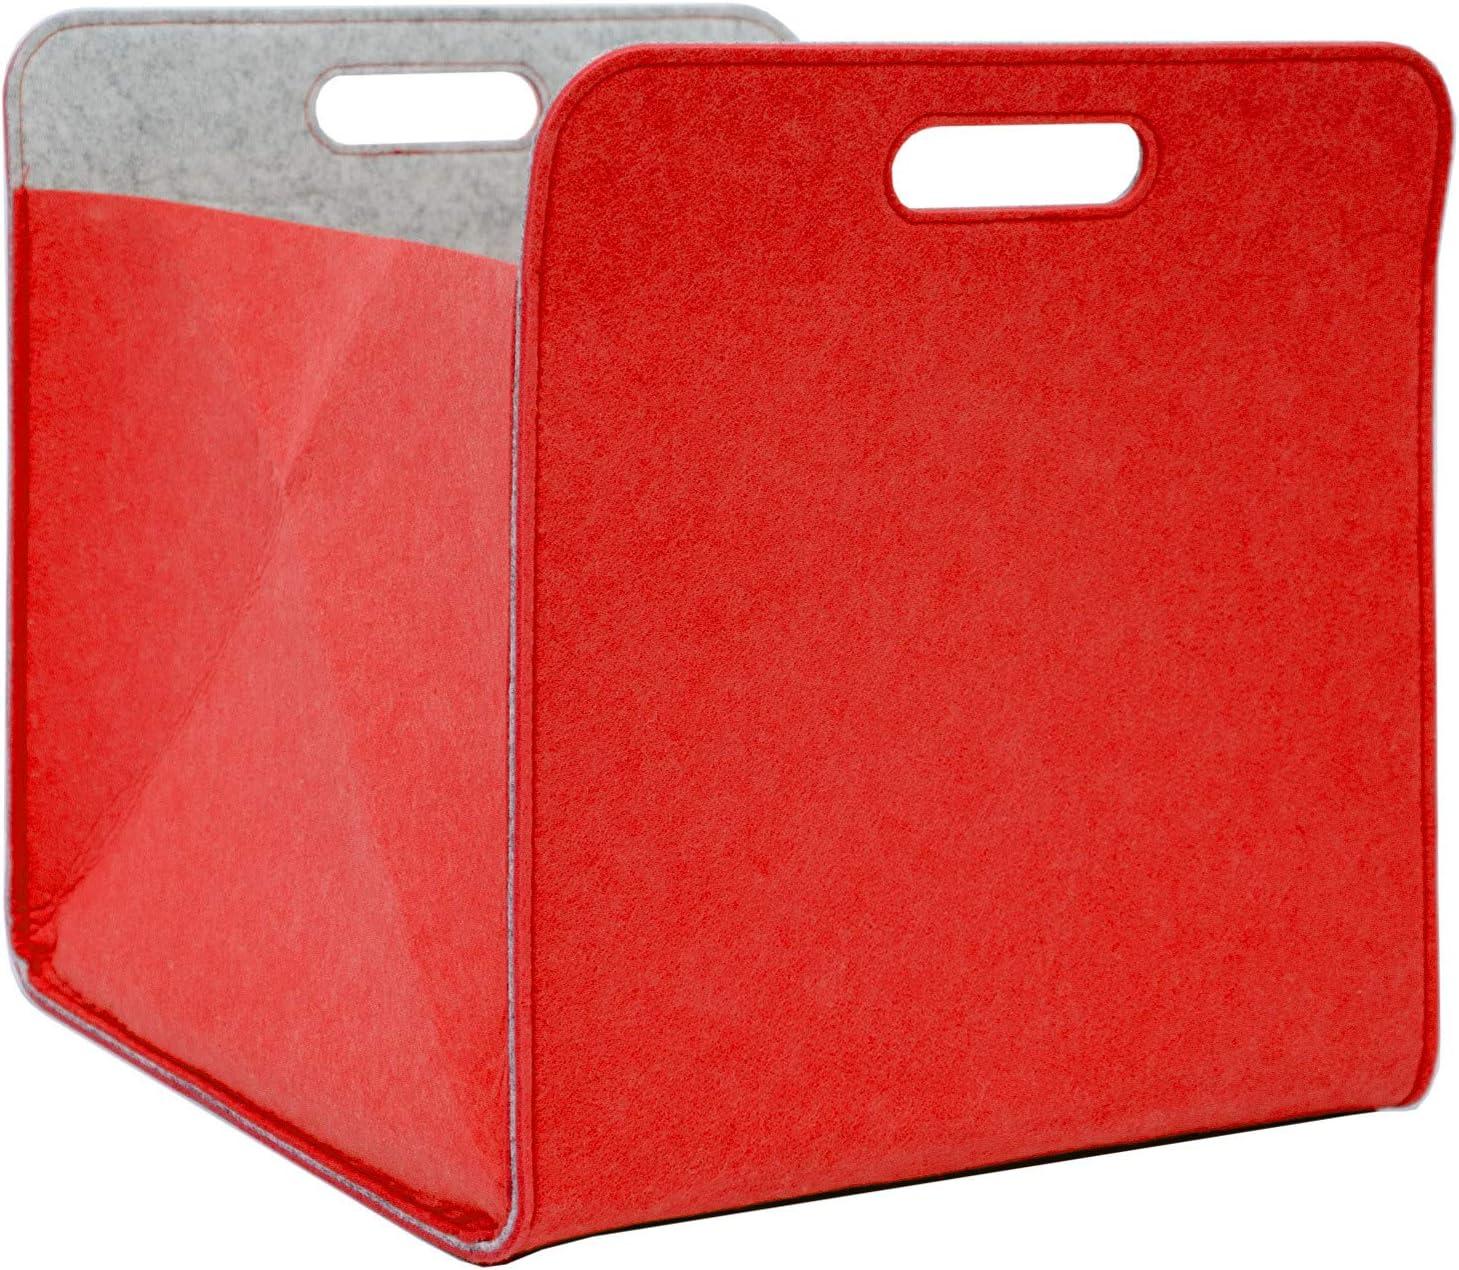 DuneDesign Caja Almacenamiento Fieltro 33x33x38cm Cesta Fieltro Caja Kallax Inserción en estanterías Rojo: Amazon.es: Hogar